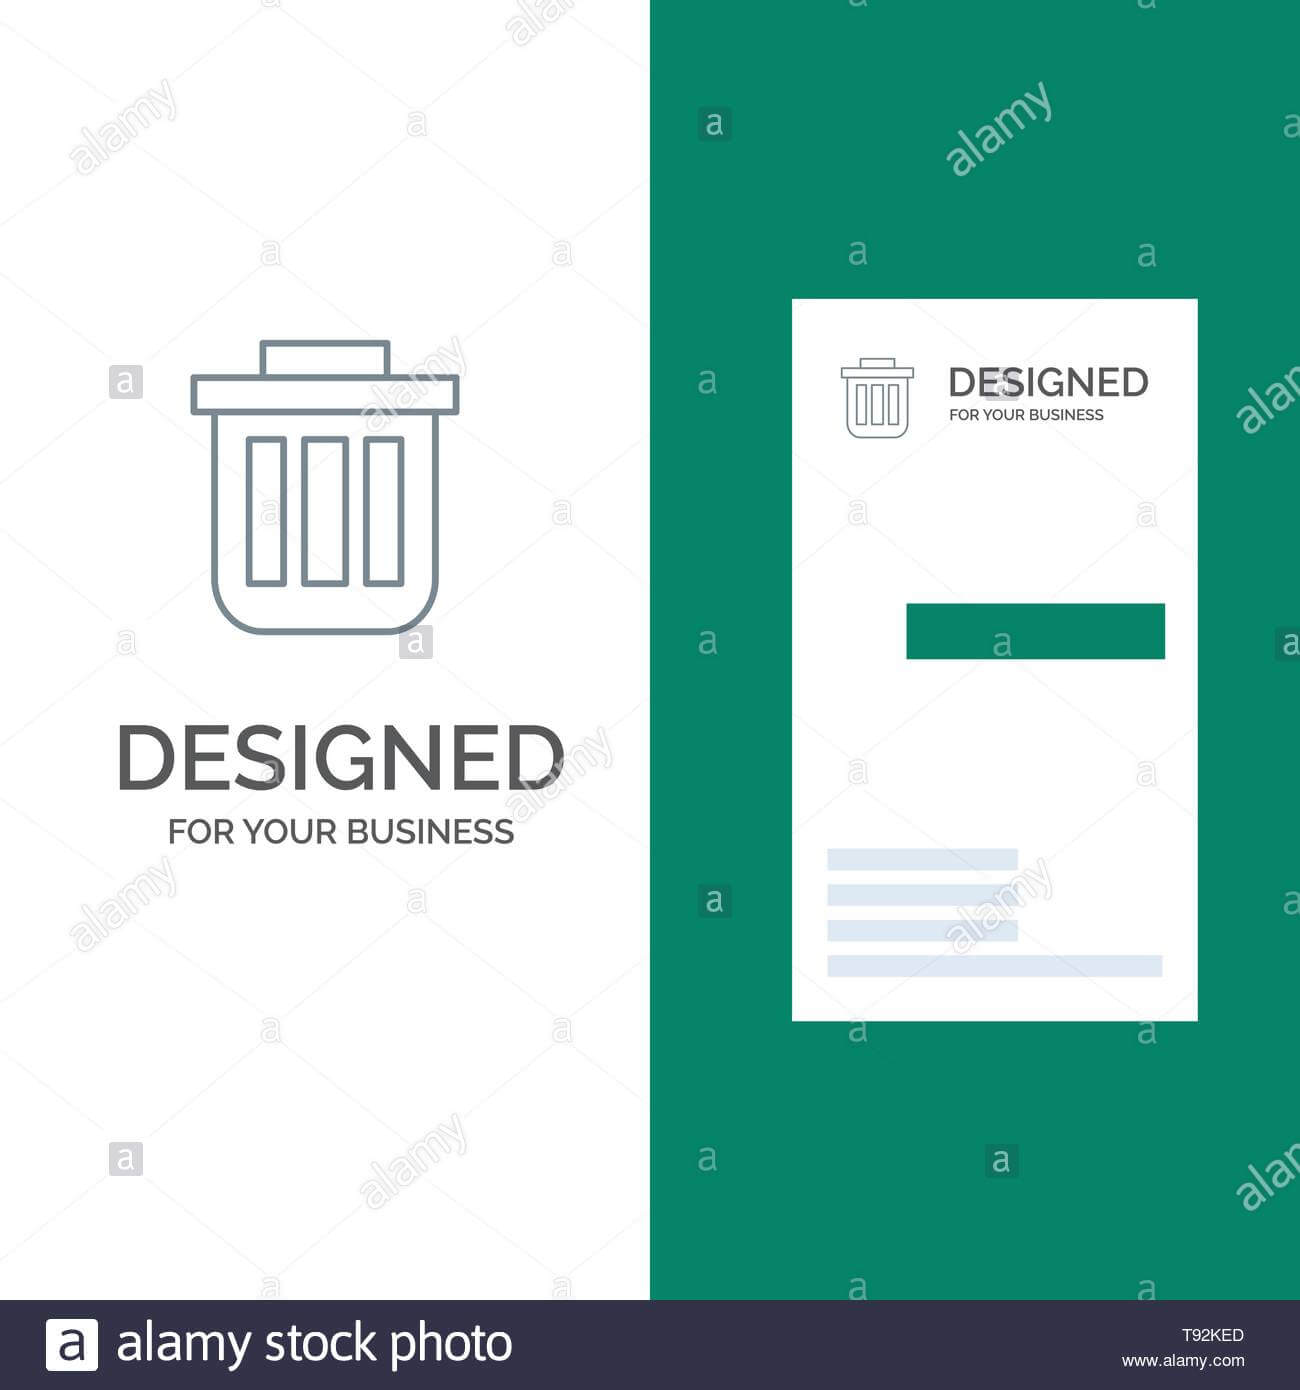 Trash, Basket, Bin, Can, Container, Dustbin, Office Grey Throughout Bin Card Template